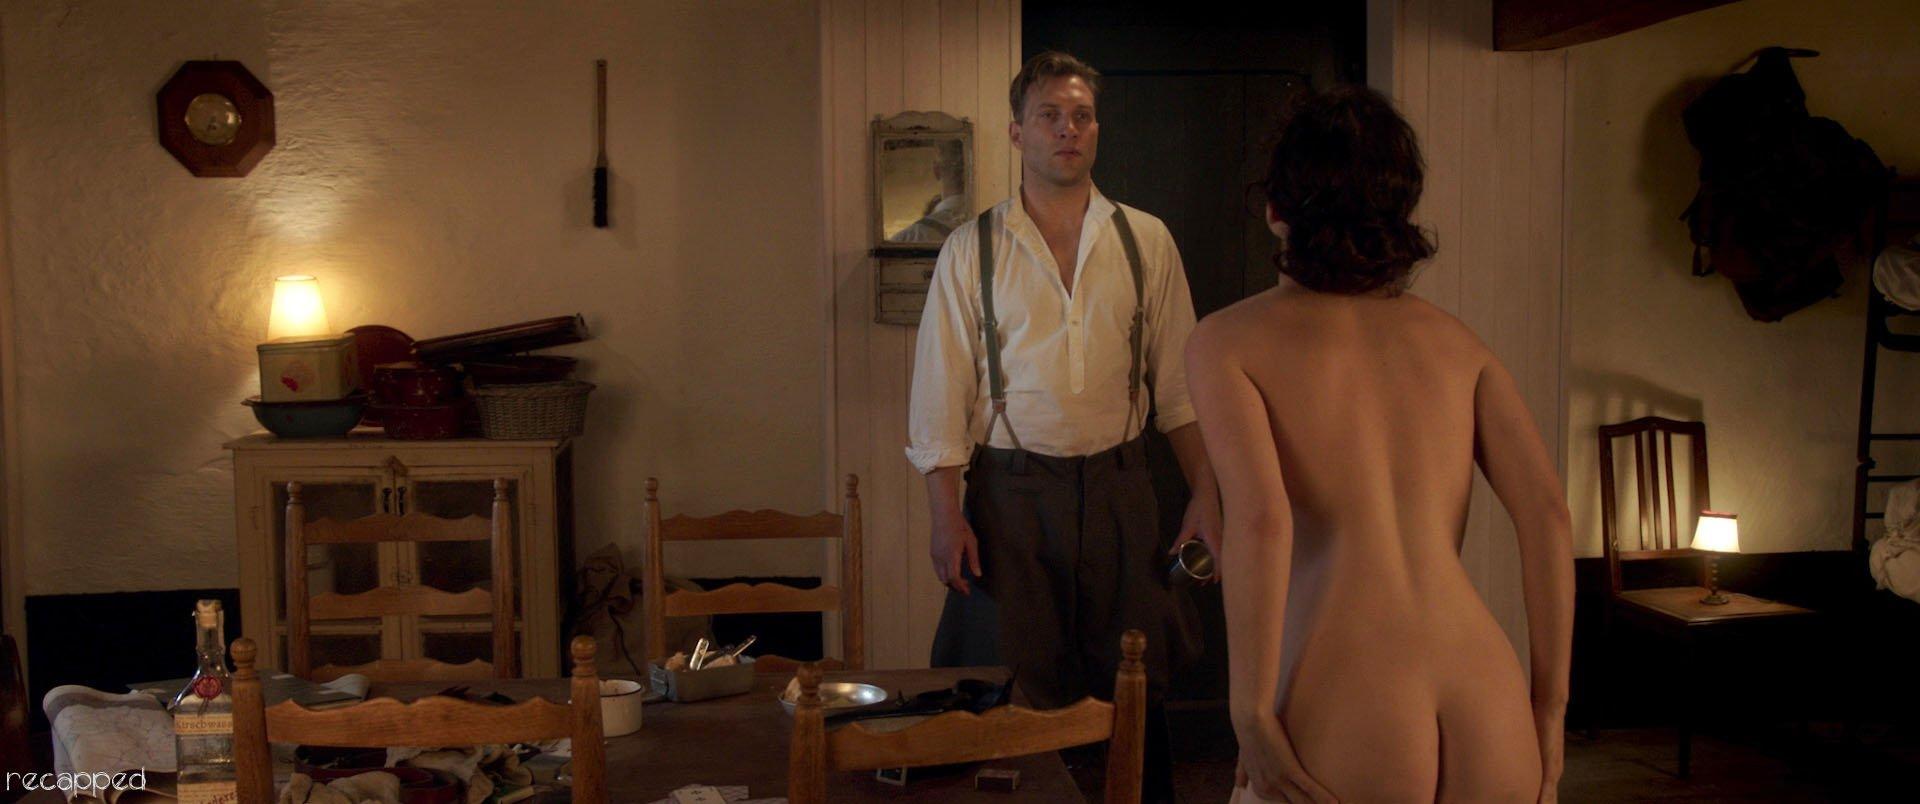 Kerry washington topless sex scene mampc - 2 2